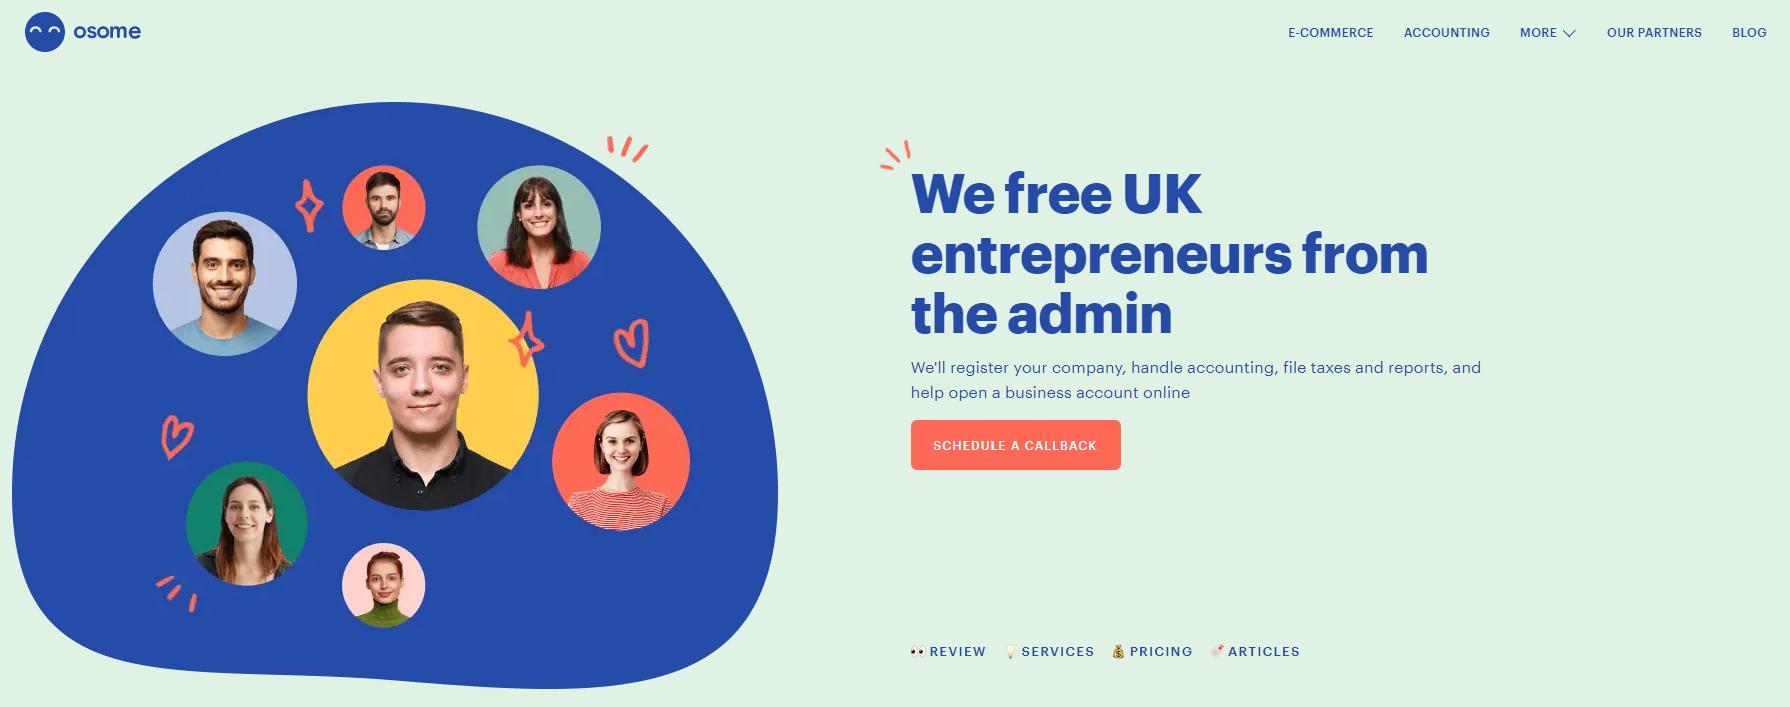 Osome Webpage in UK